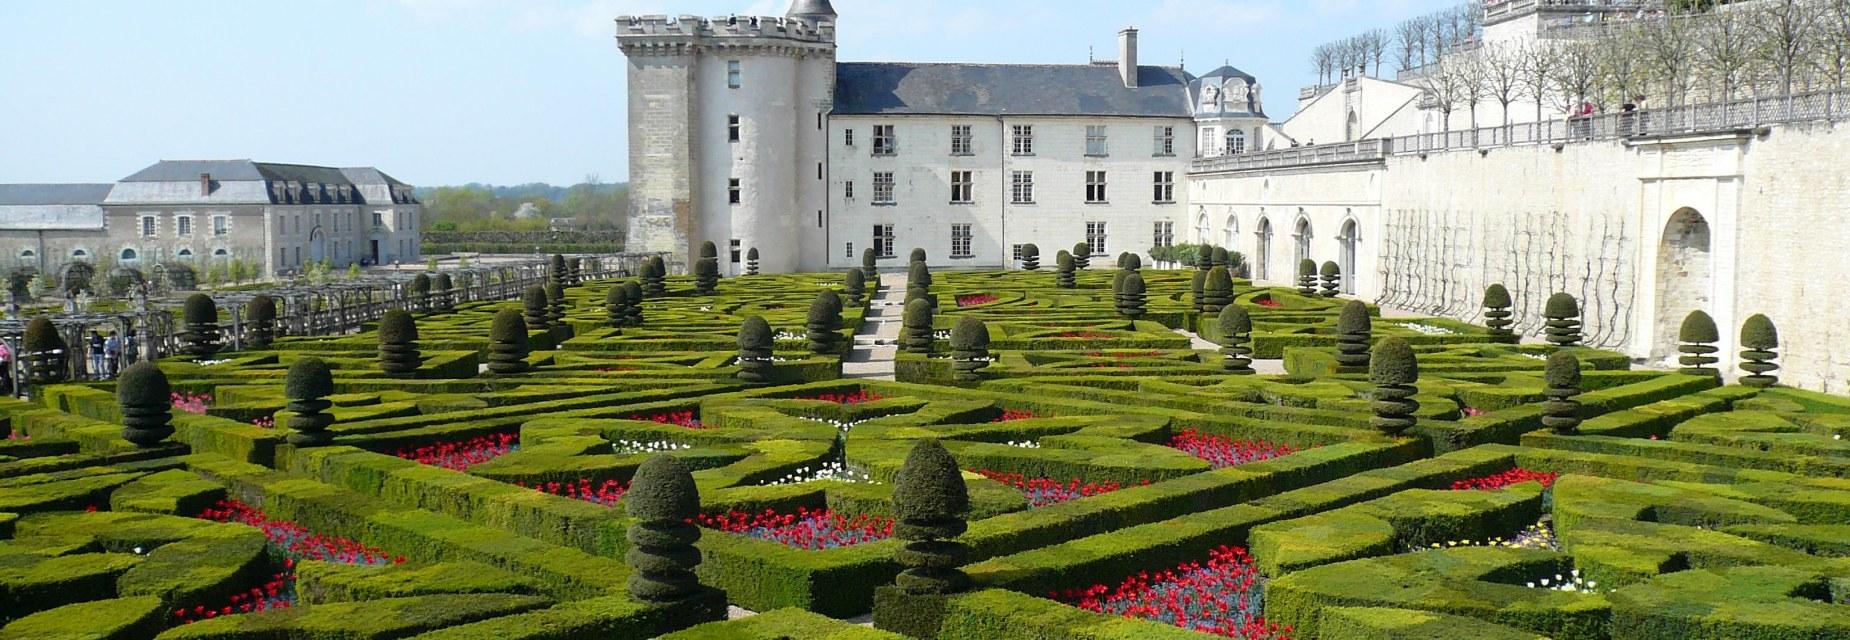 Château.de.Villandry.France